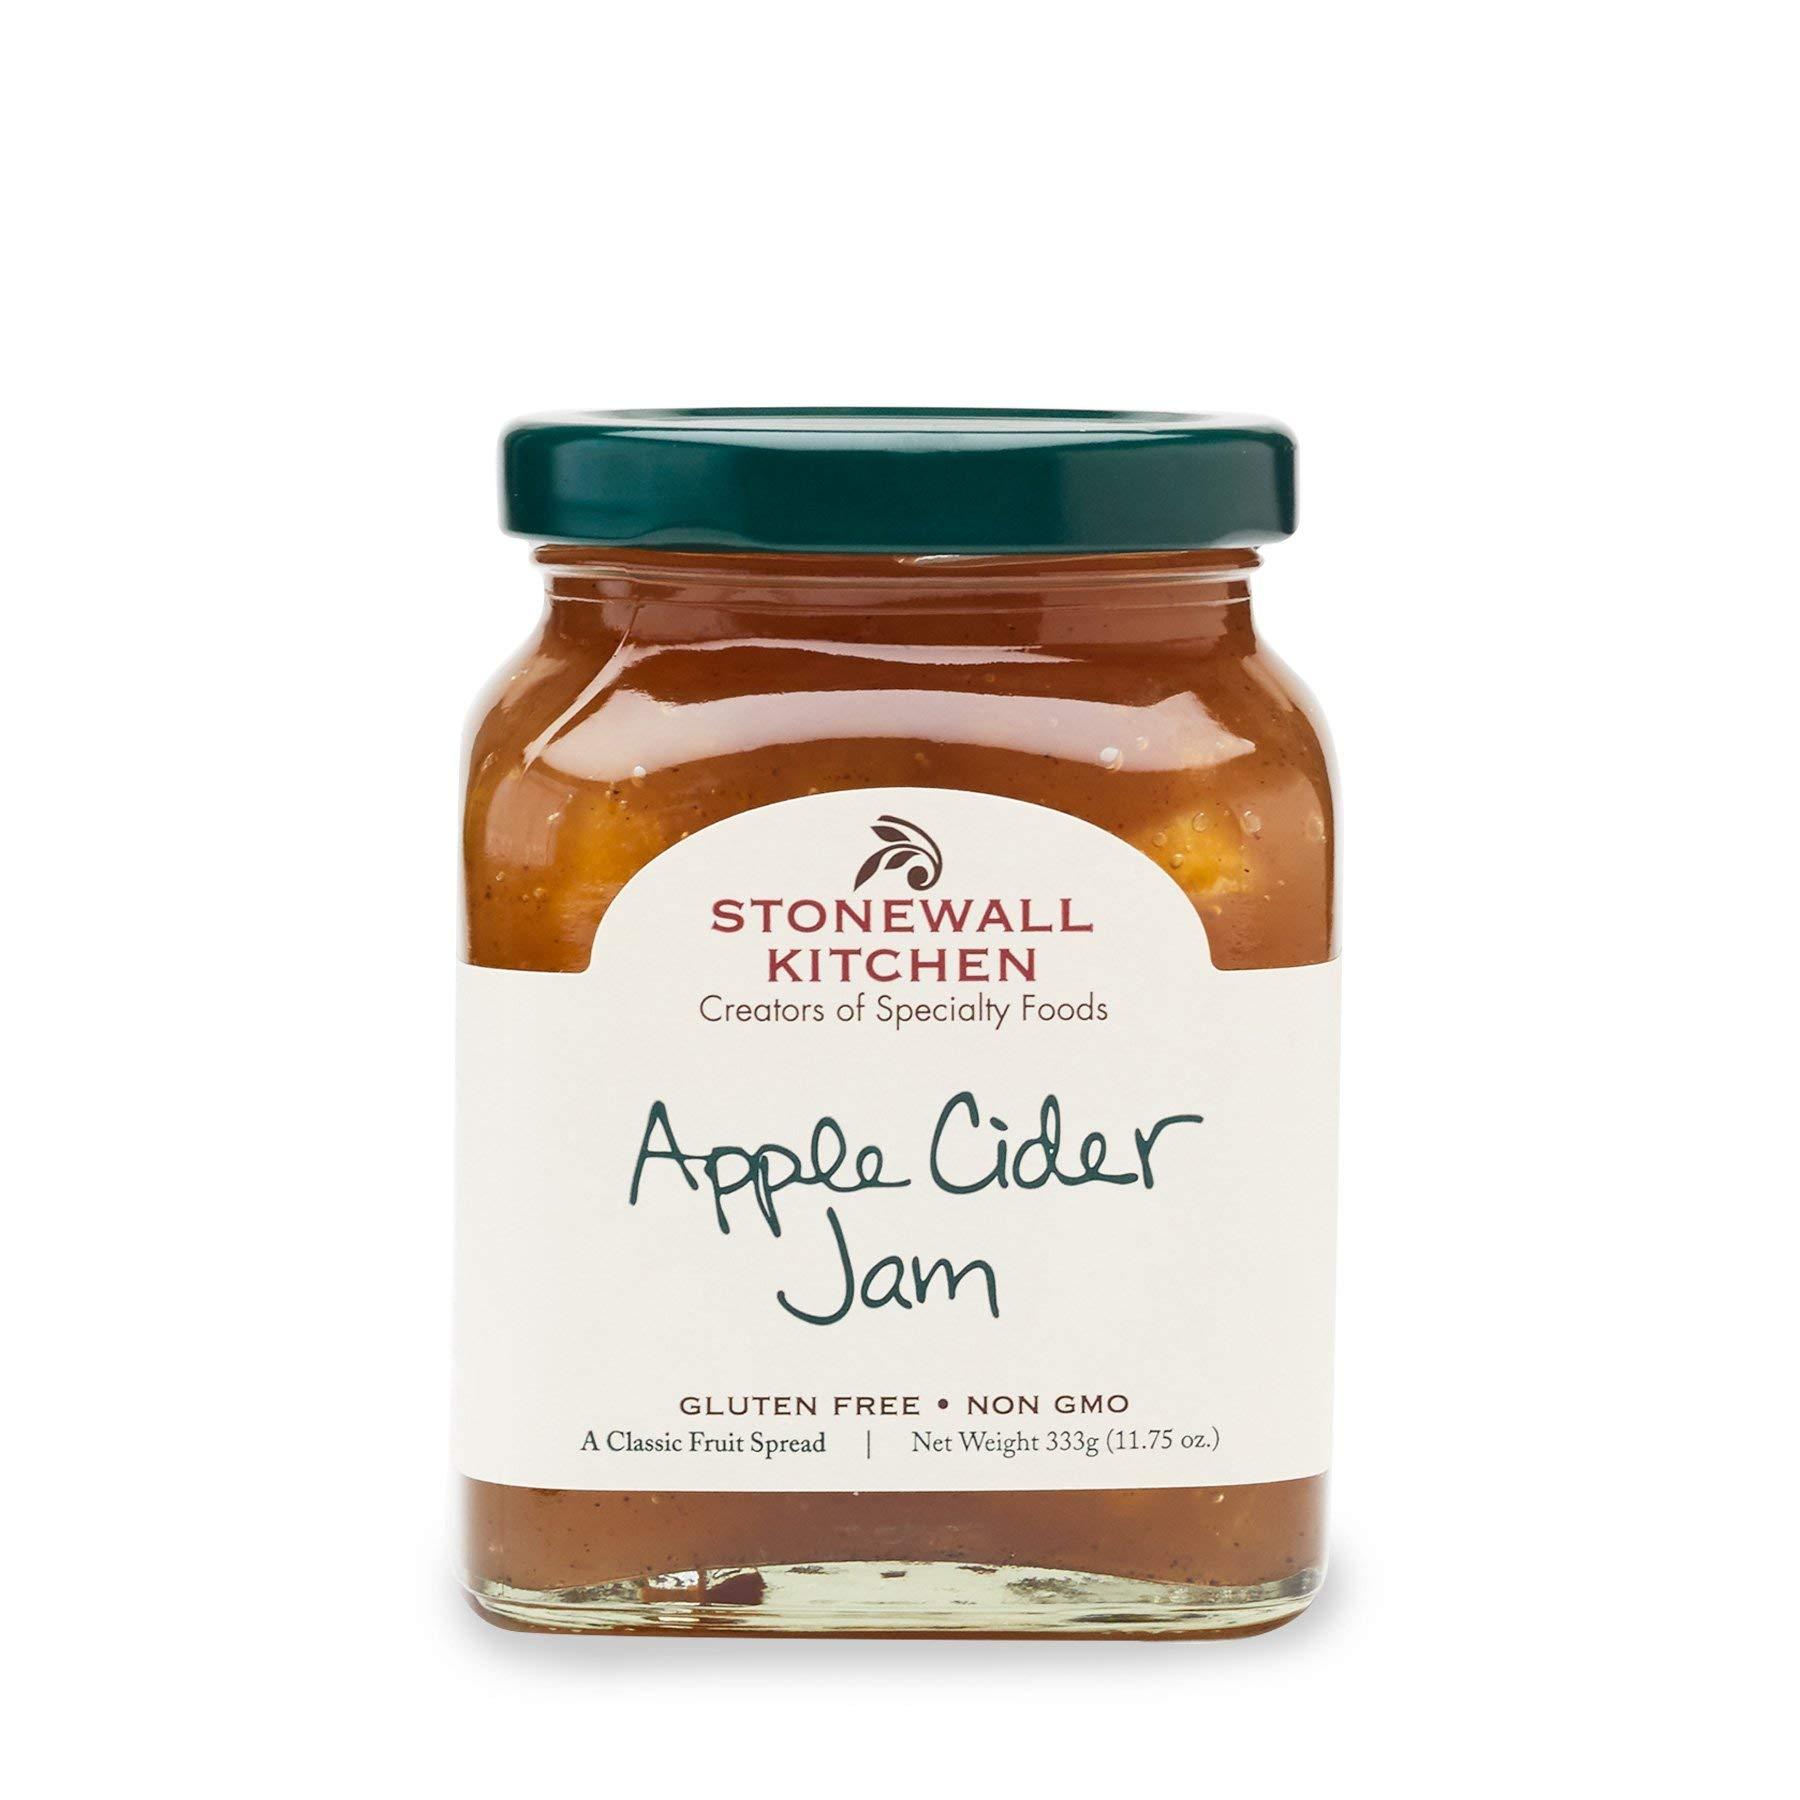 Stonewall Kitchen Apple Cider Jam, 11.75 Ounces